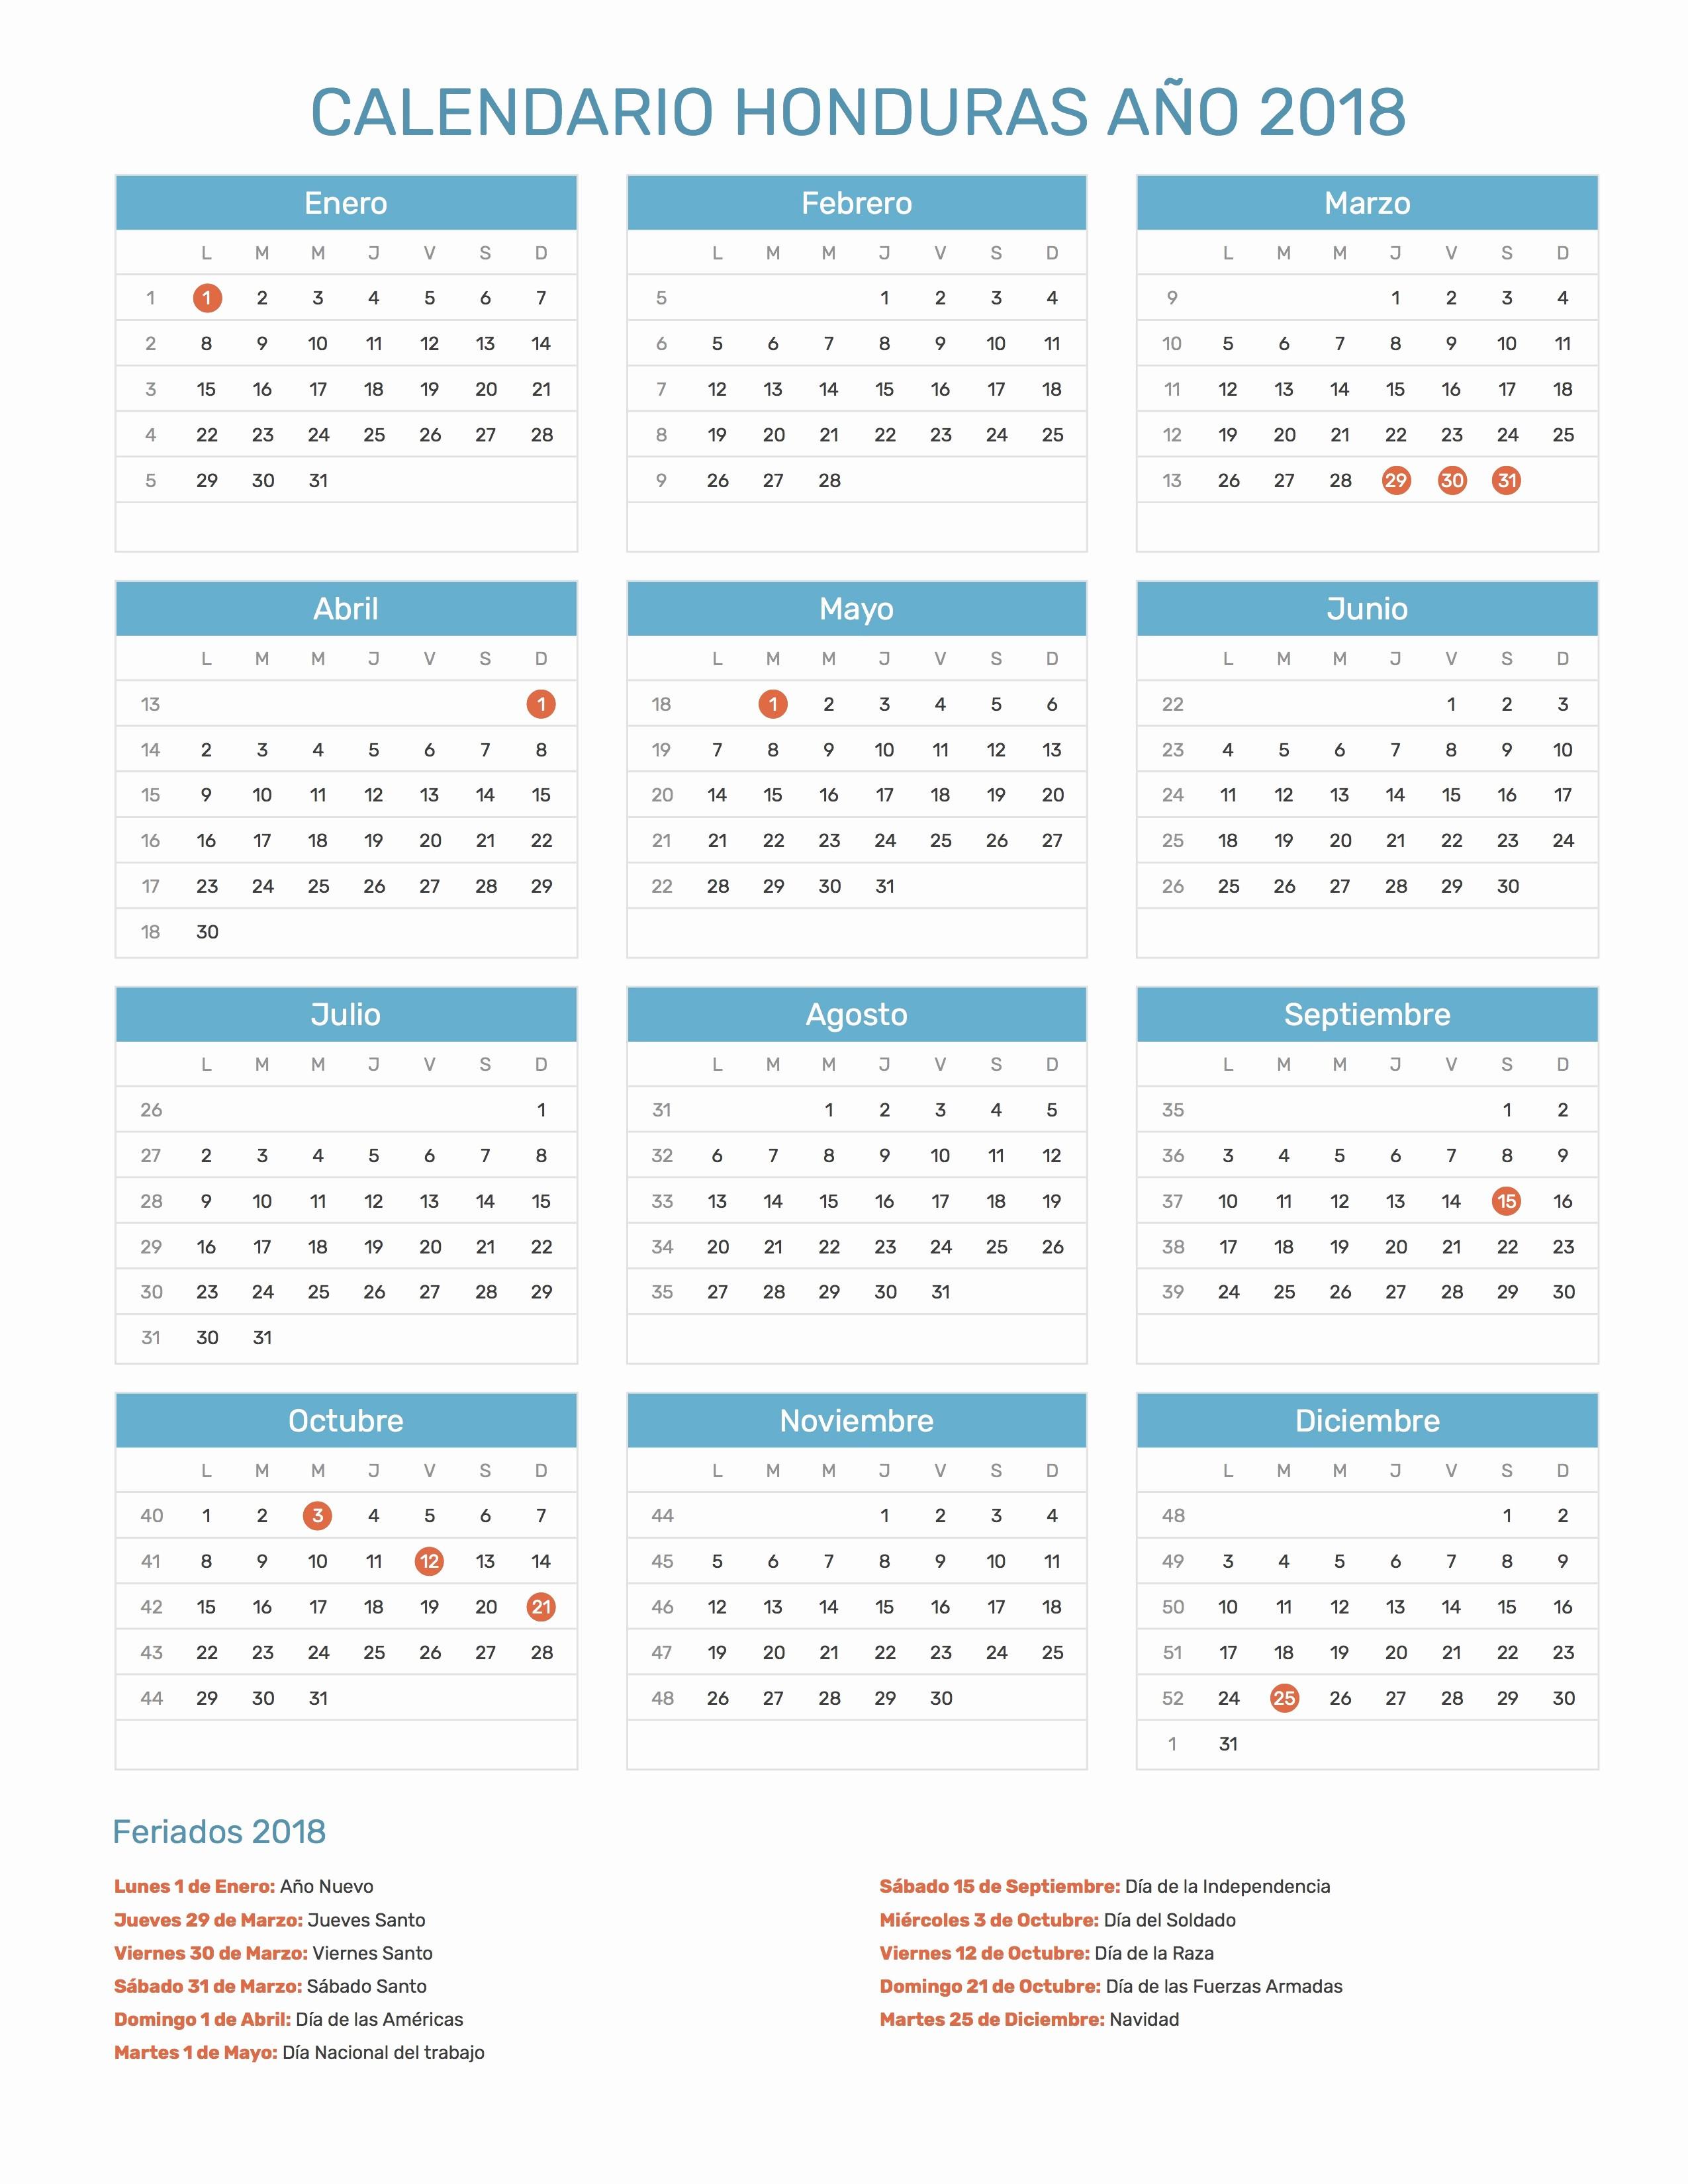 Calendario 2019 Con Dias Festivos Ecuador Más Caliente Calendario Gregriano 1912 2019 Vacaciones Calendario Laboral 2017 En Of Calendario 2019 Con Dias Festivos Ecuador Actual Elephone P8 Mini 5 0 Pulgadas 4gb Ram 64gb Rom Mtk6750t Octa Core 4g